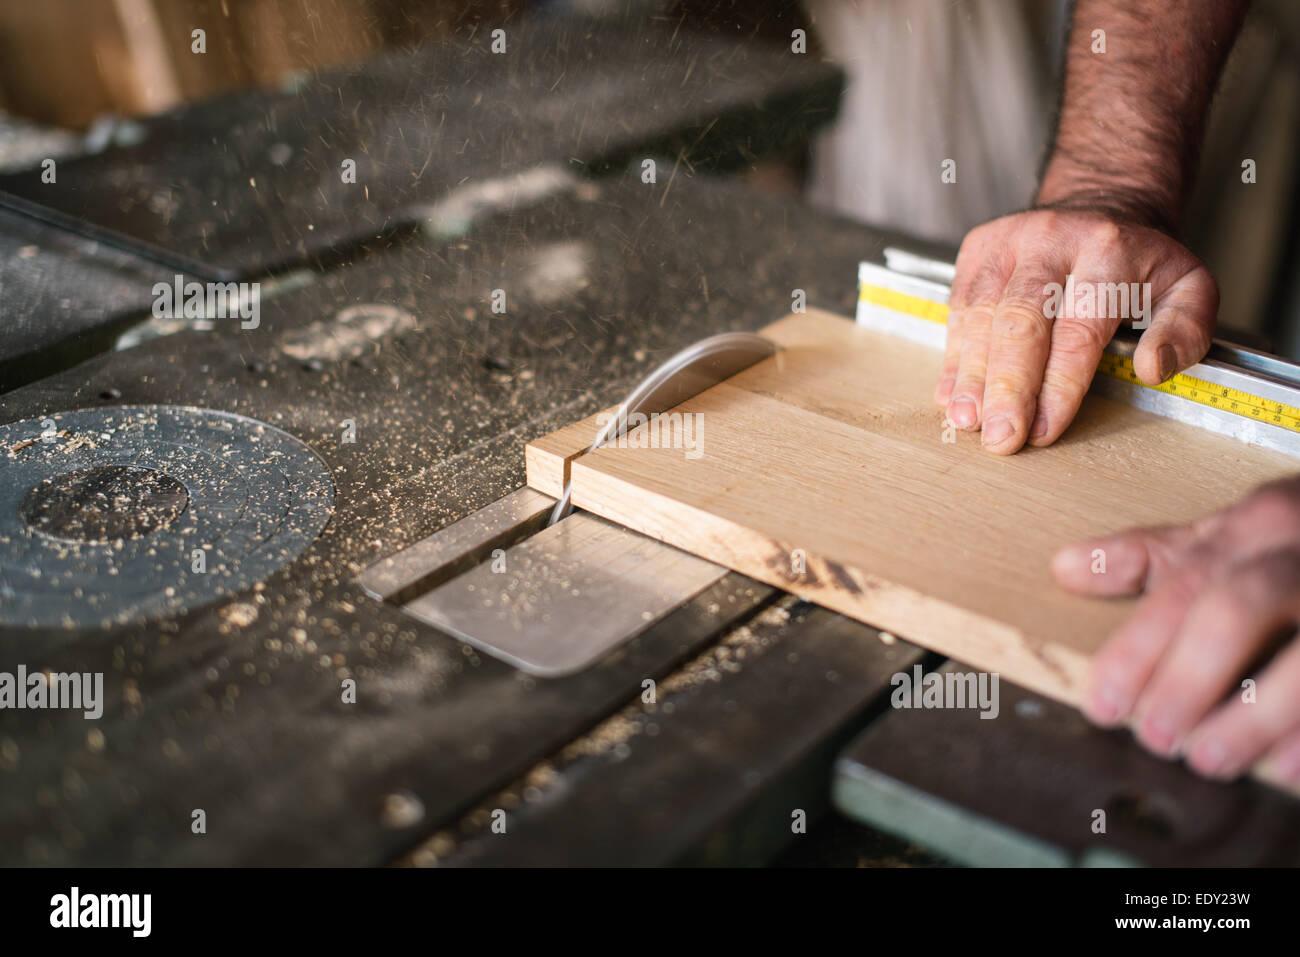 Carpenter working on the circular saw - Stock Image